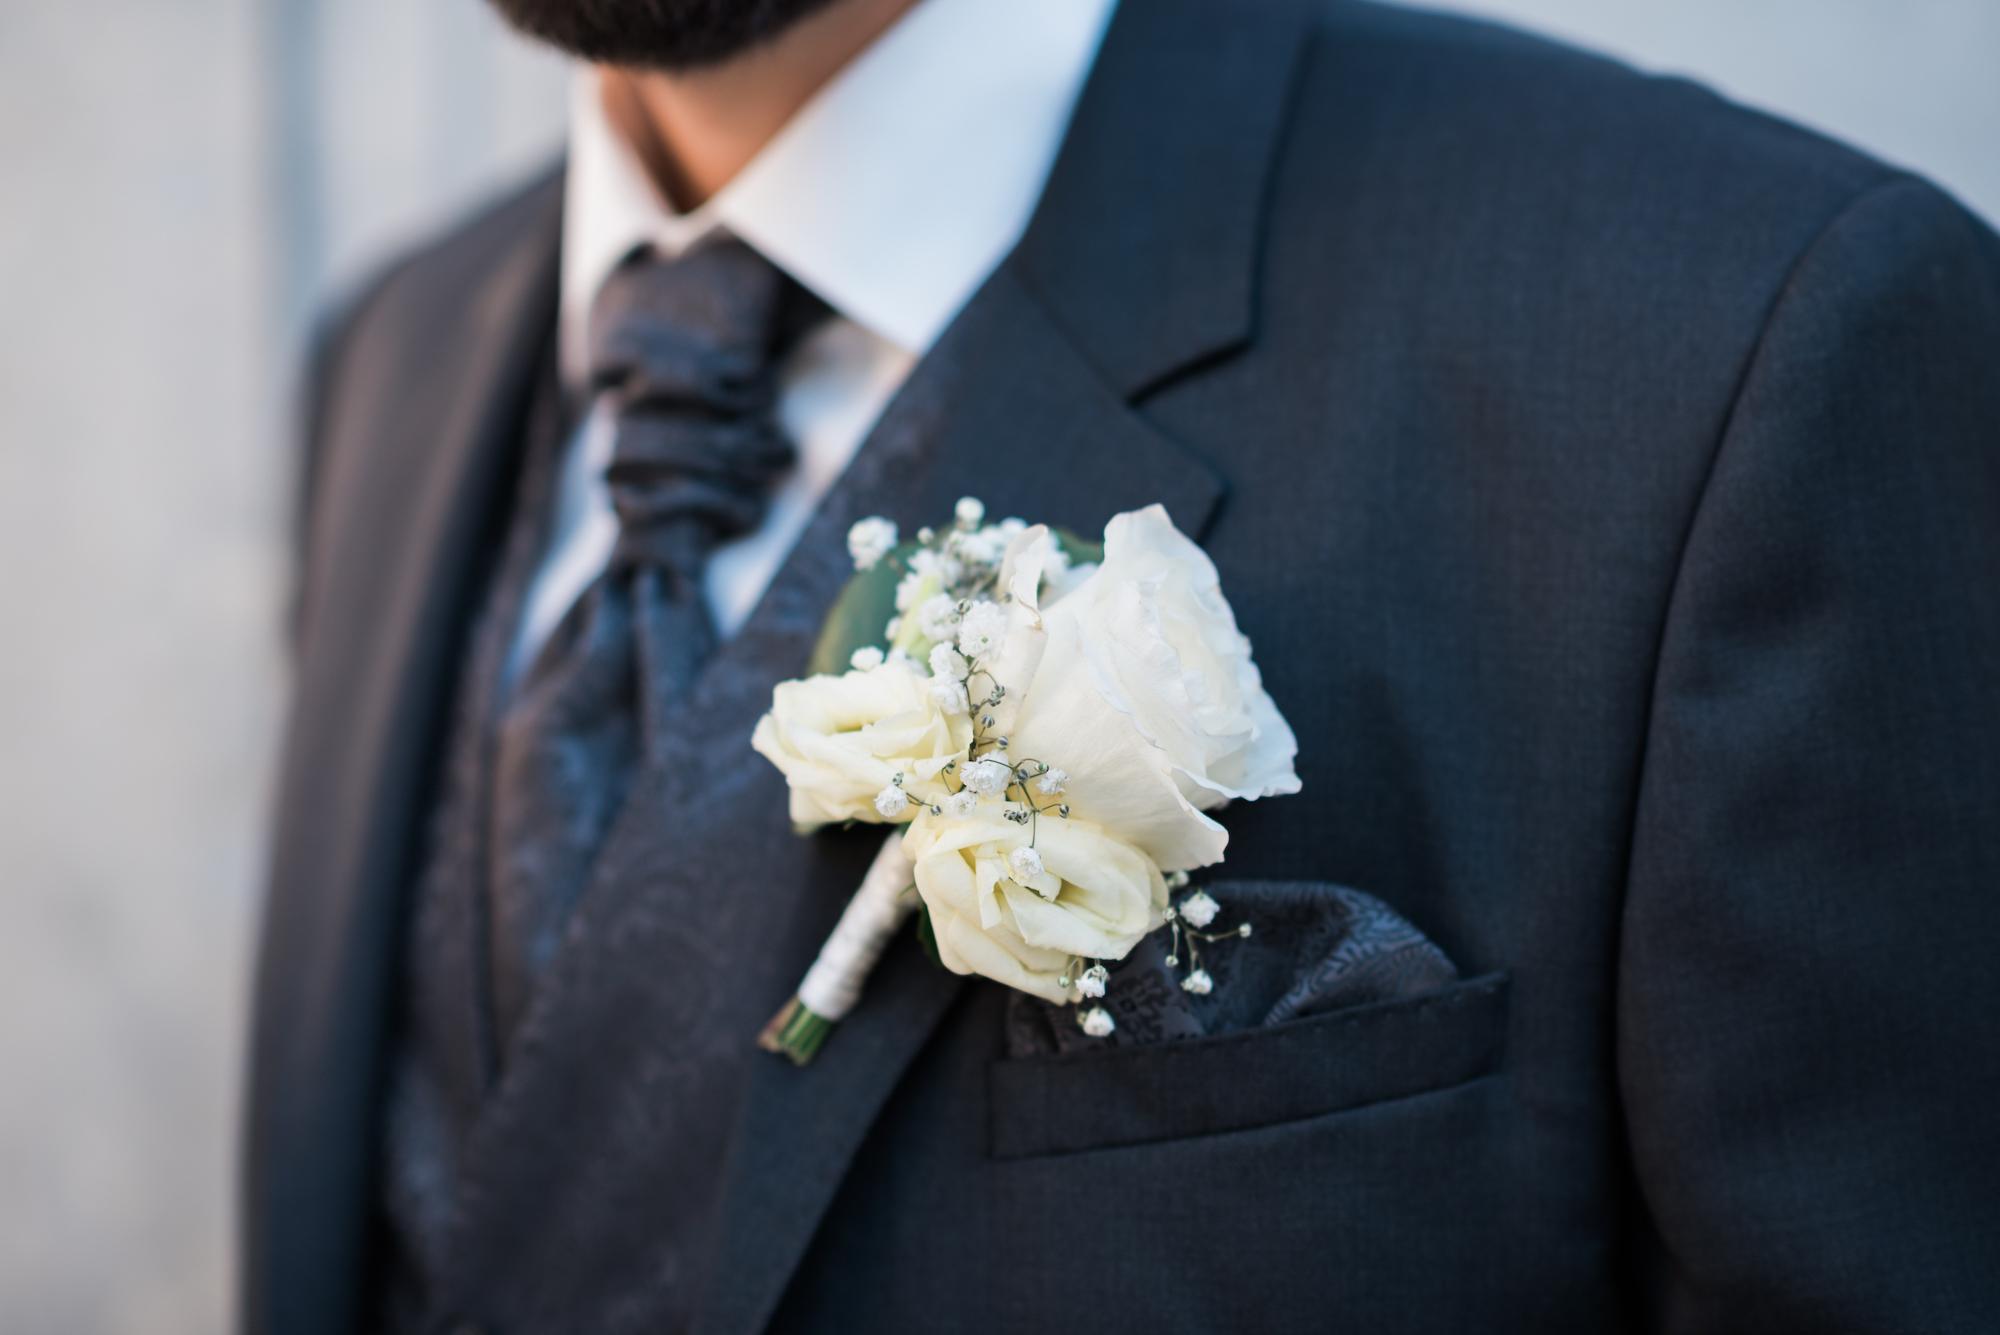 NadiaundMichael_Hochzeit_BekaBitterliFotografie_357.jpg